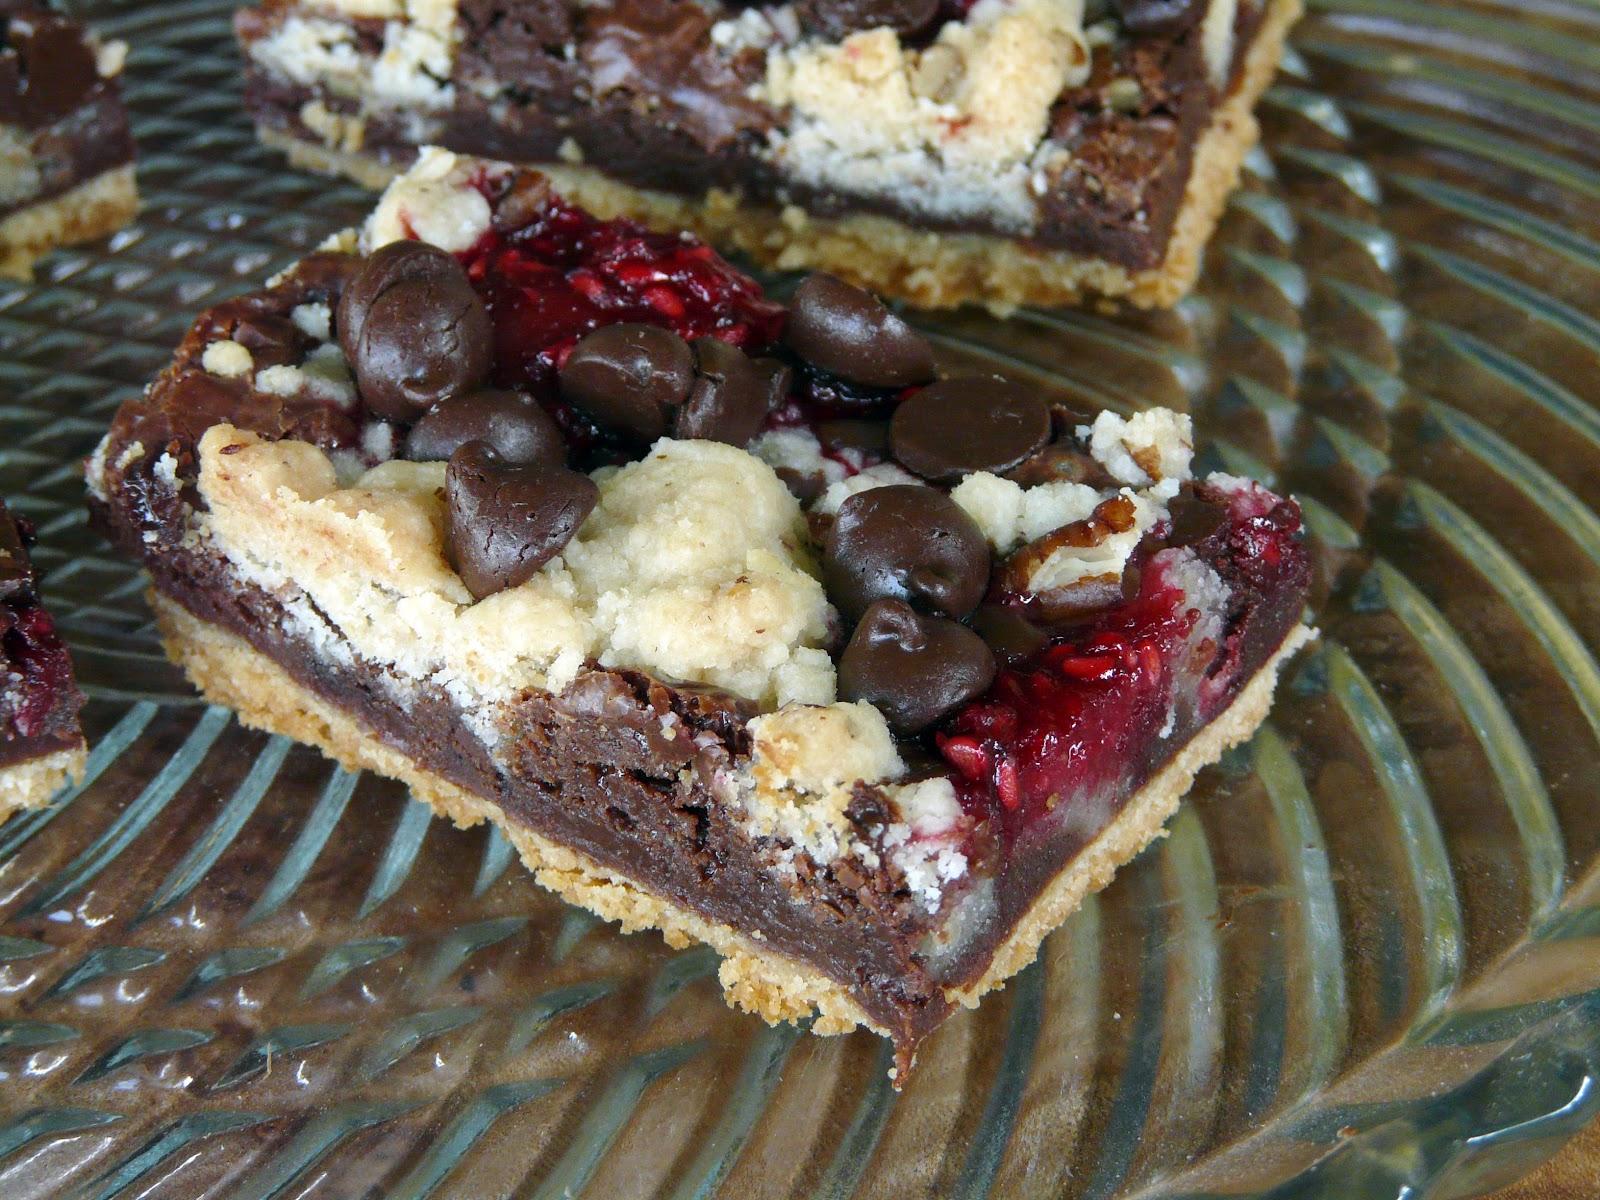 Thibeault 39 S Table Chocolate Raspberry Crumb Bars